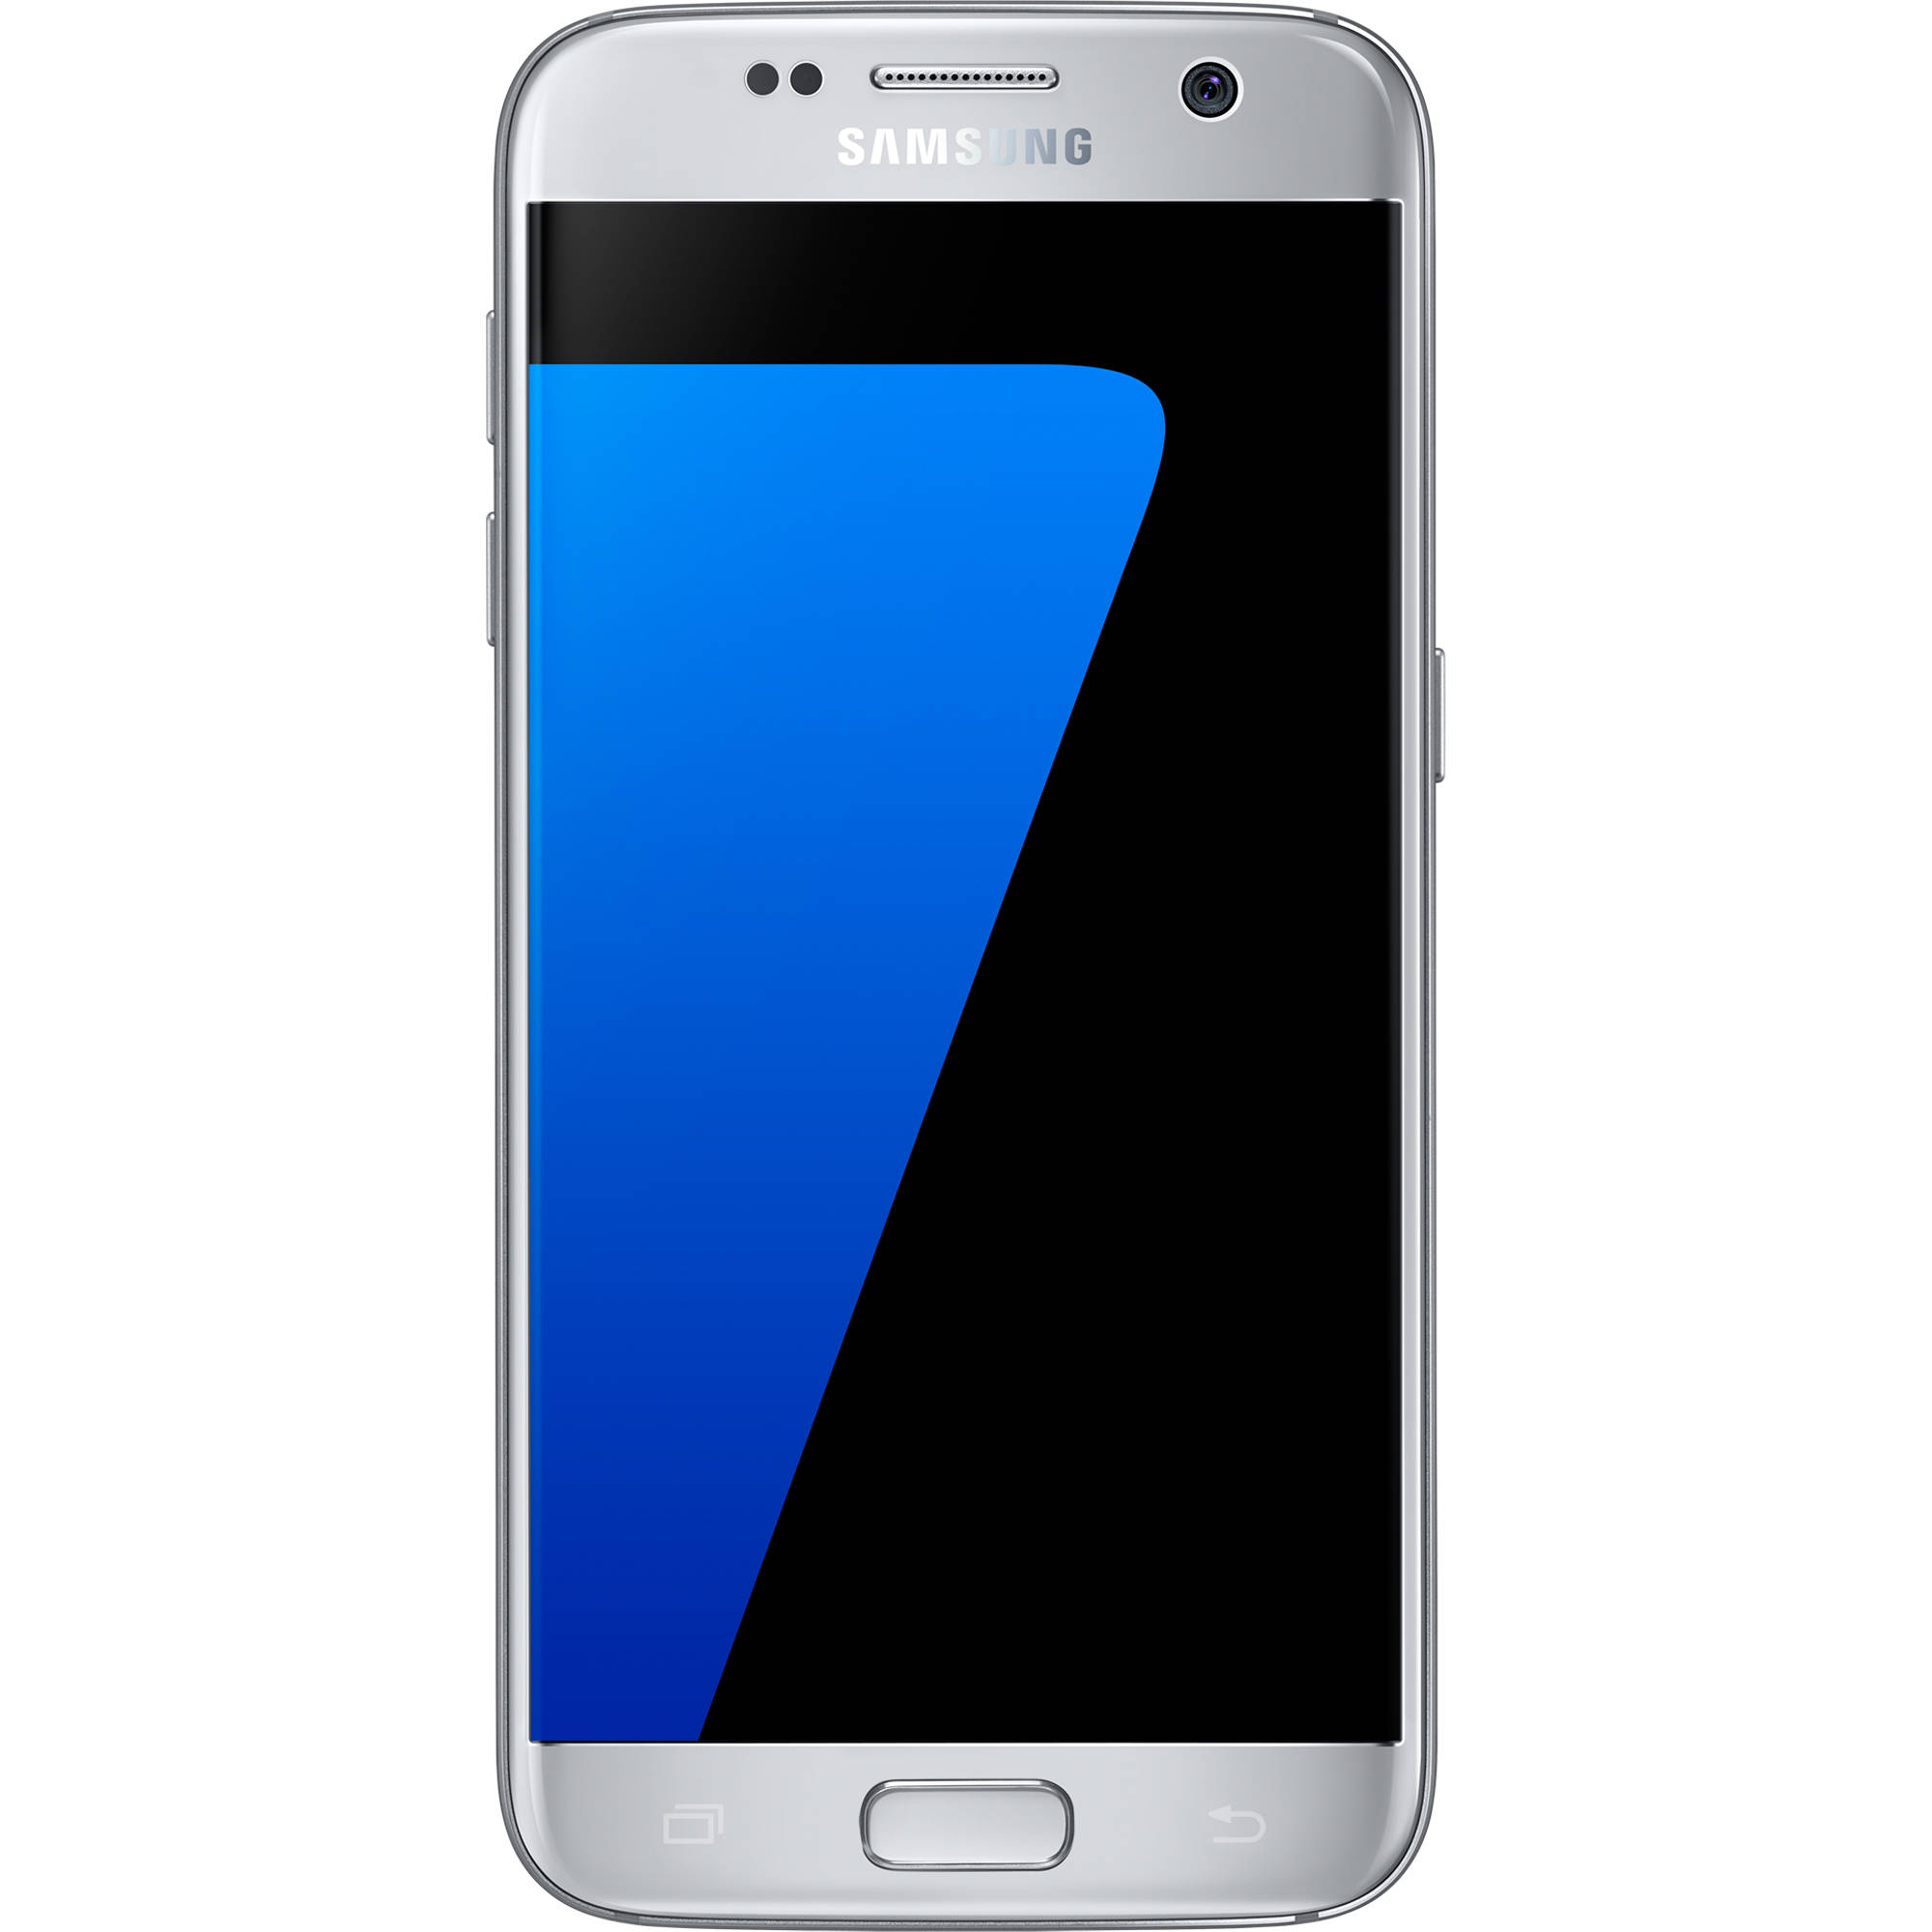 h samsung s7 samsung galaxy s7 sm g930f 32gb smartphone sm g930f 32gb slv b h